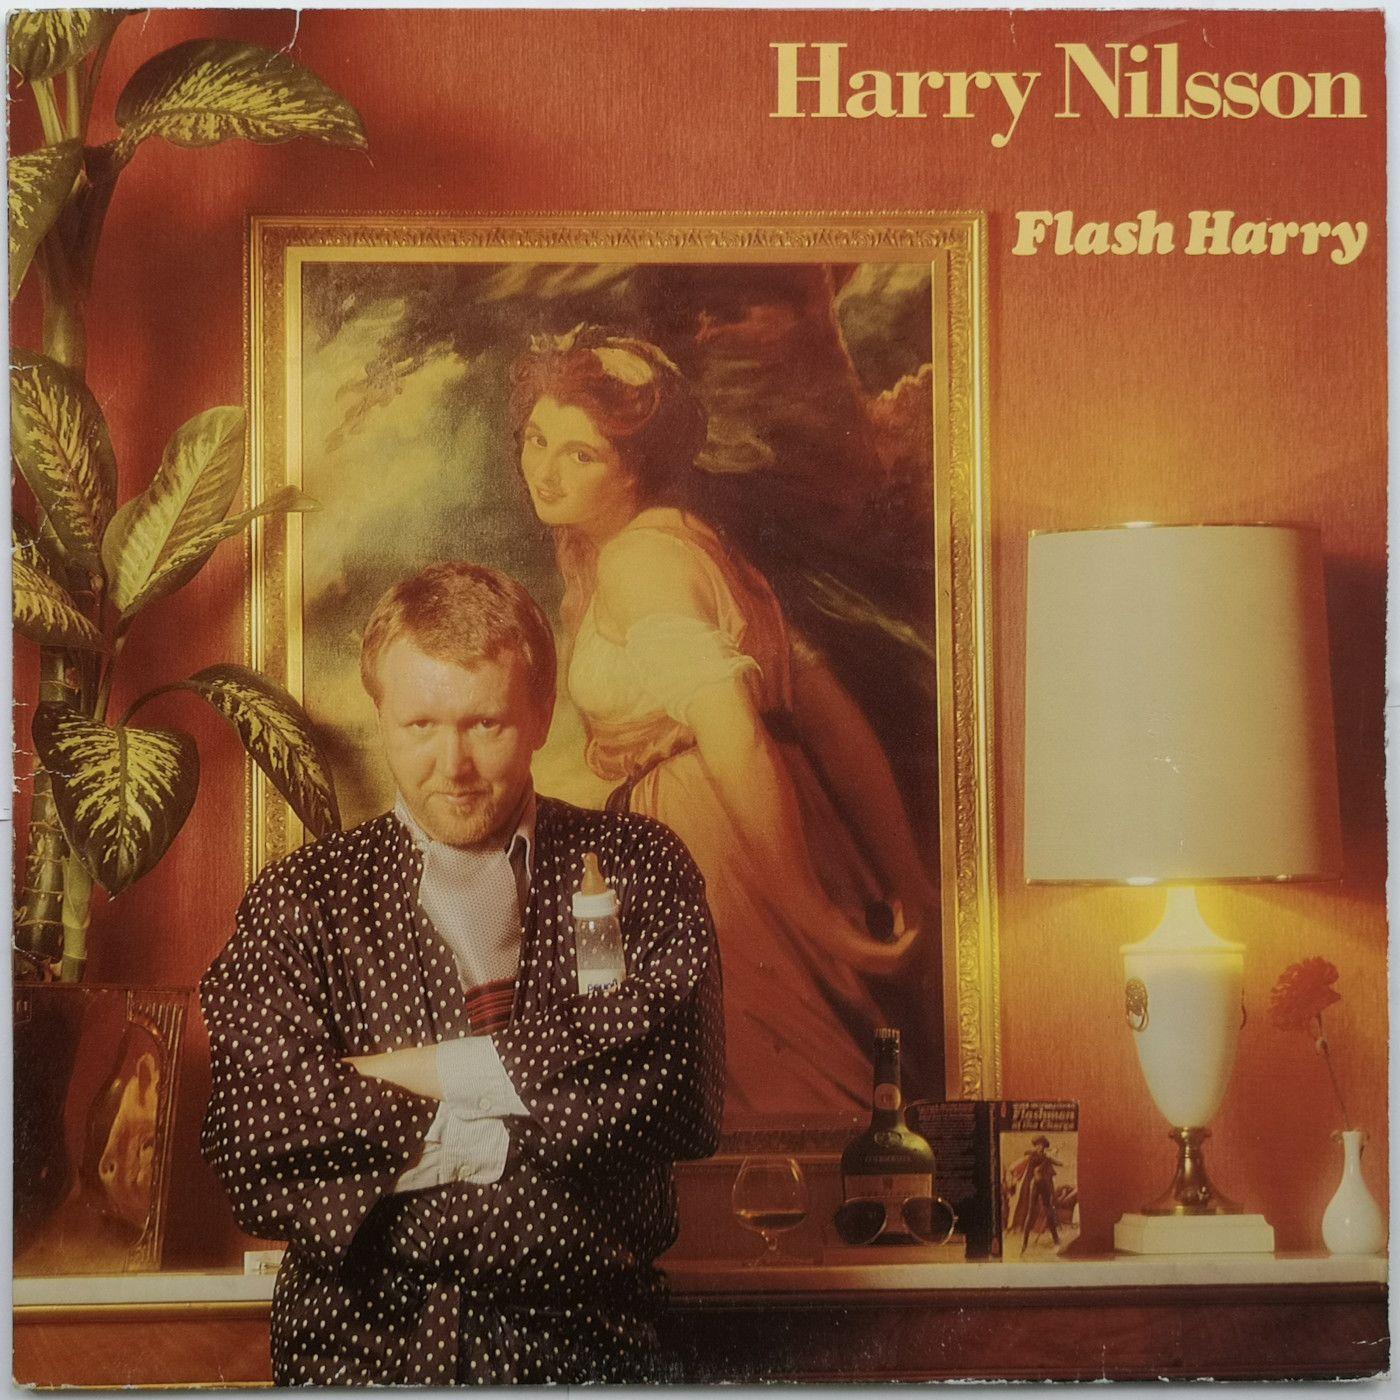 Harry Nilsson (with Ringo Starr, Klaus Voorman, Van Dyke Parks...) Flash Harry LP undefined